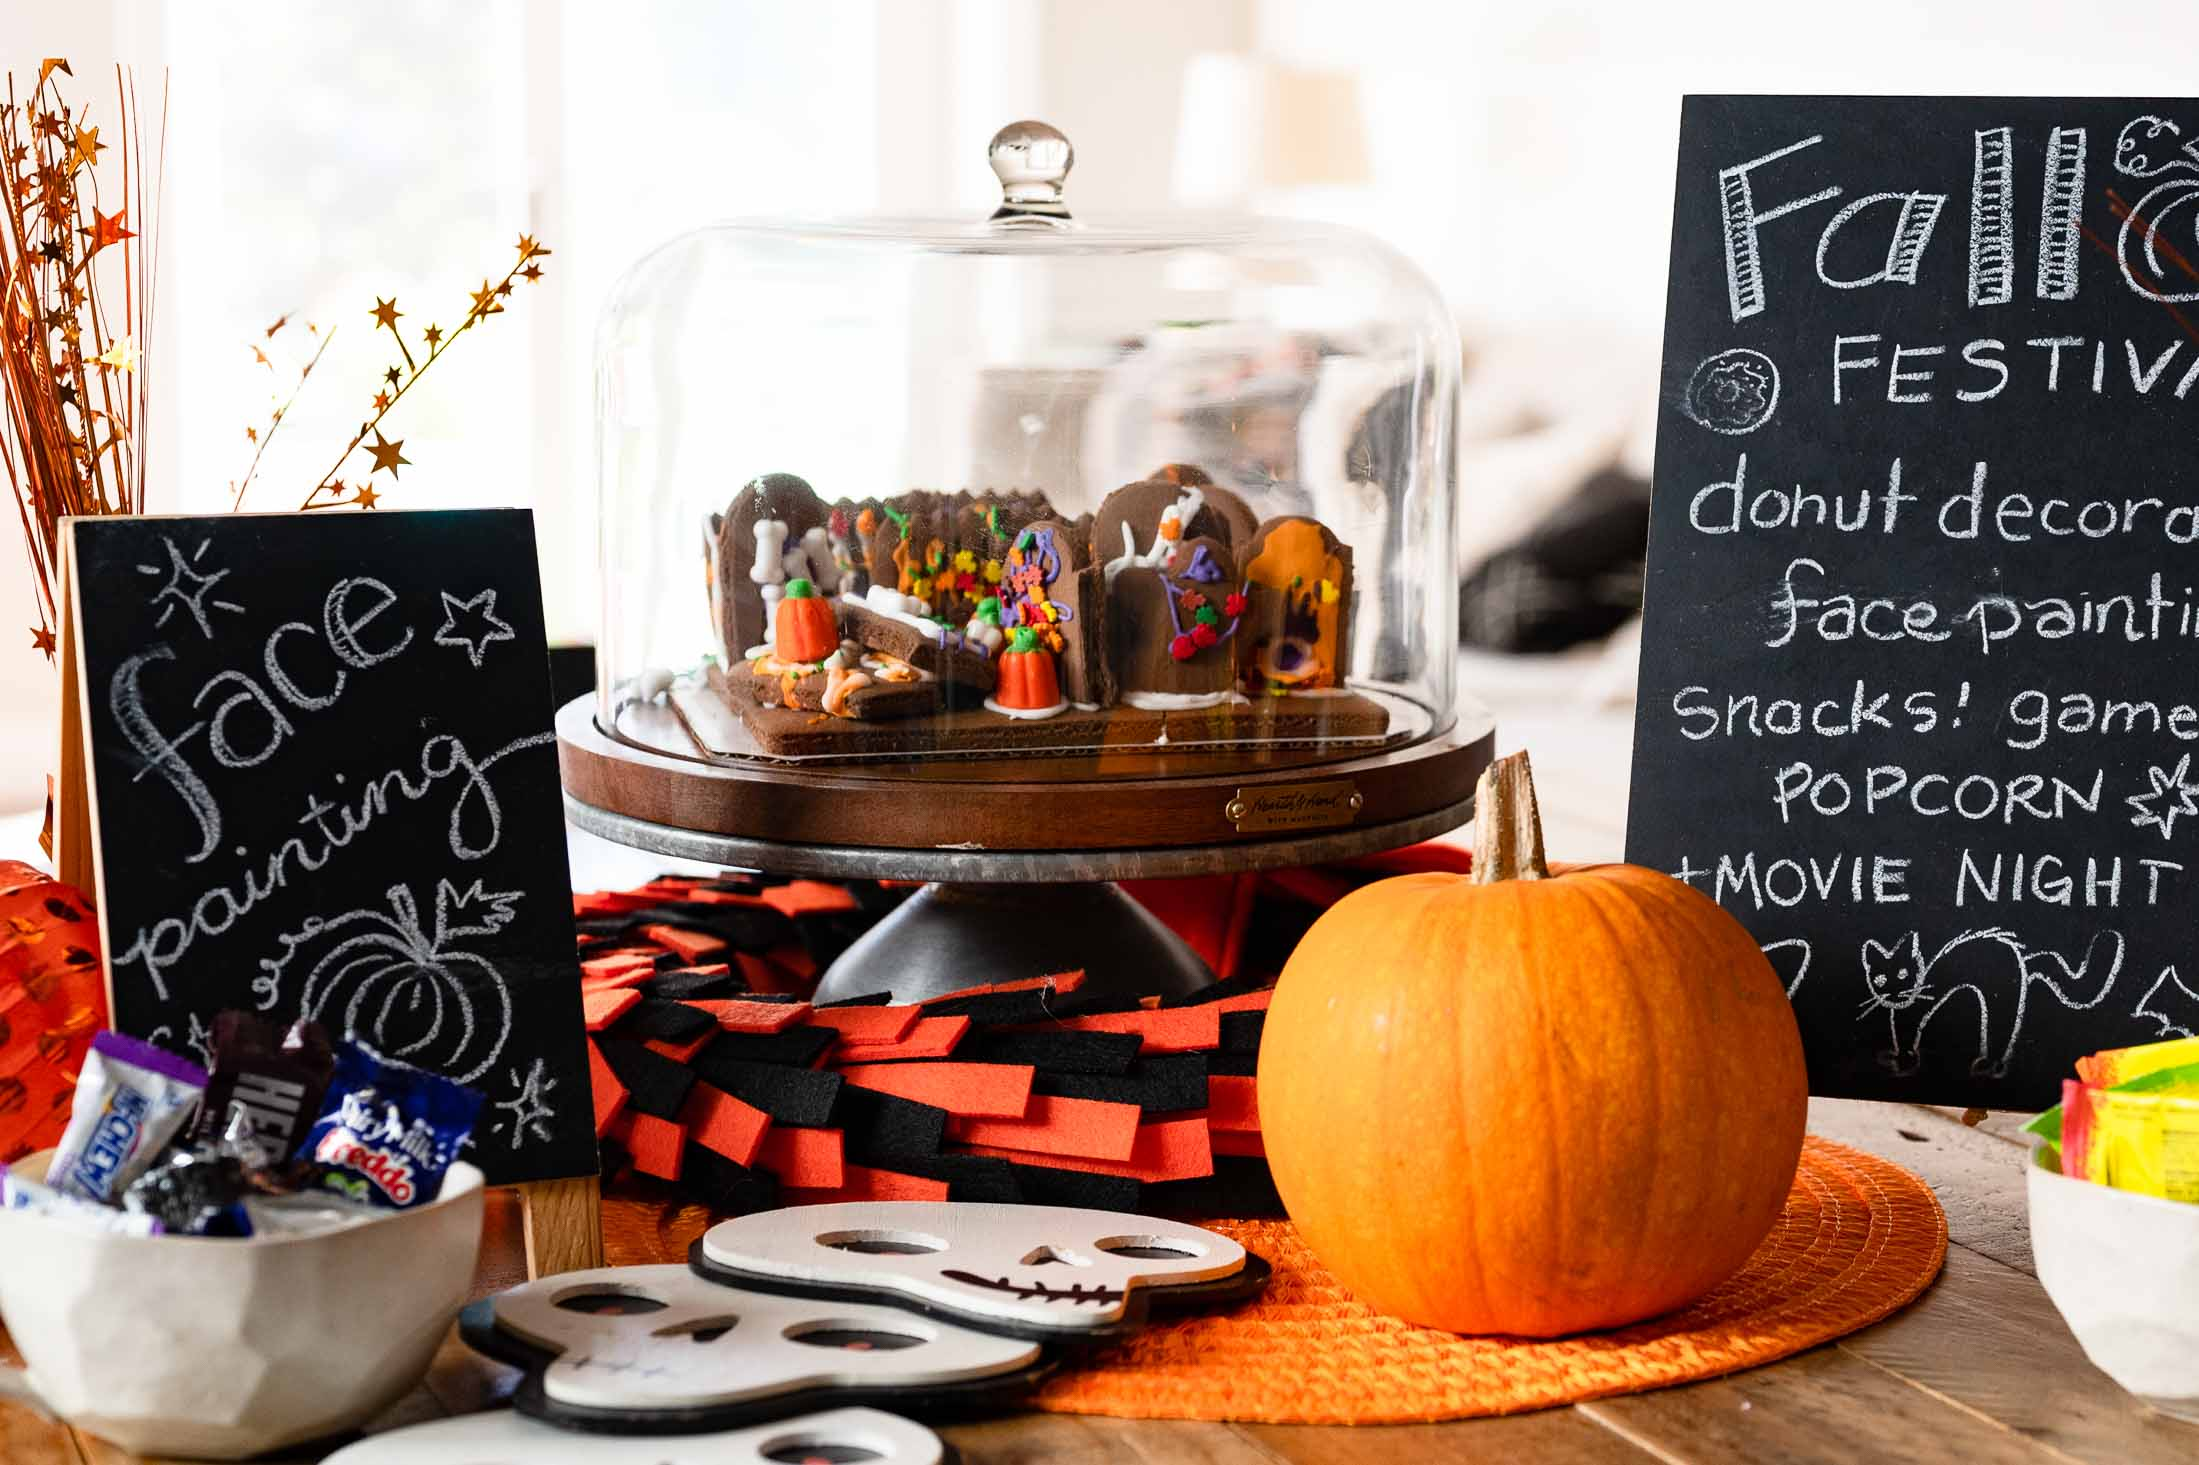 Easy Kids Halloween Fest 10 Diy Activities Backyard Party Ideas The Mom Edit